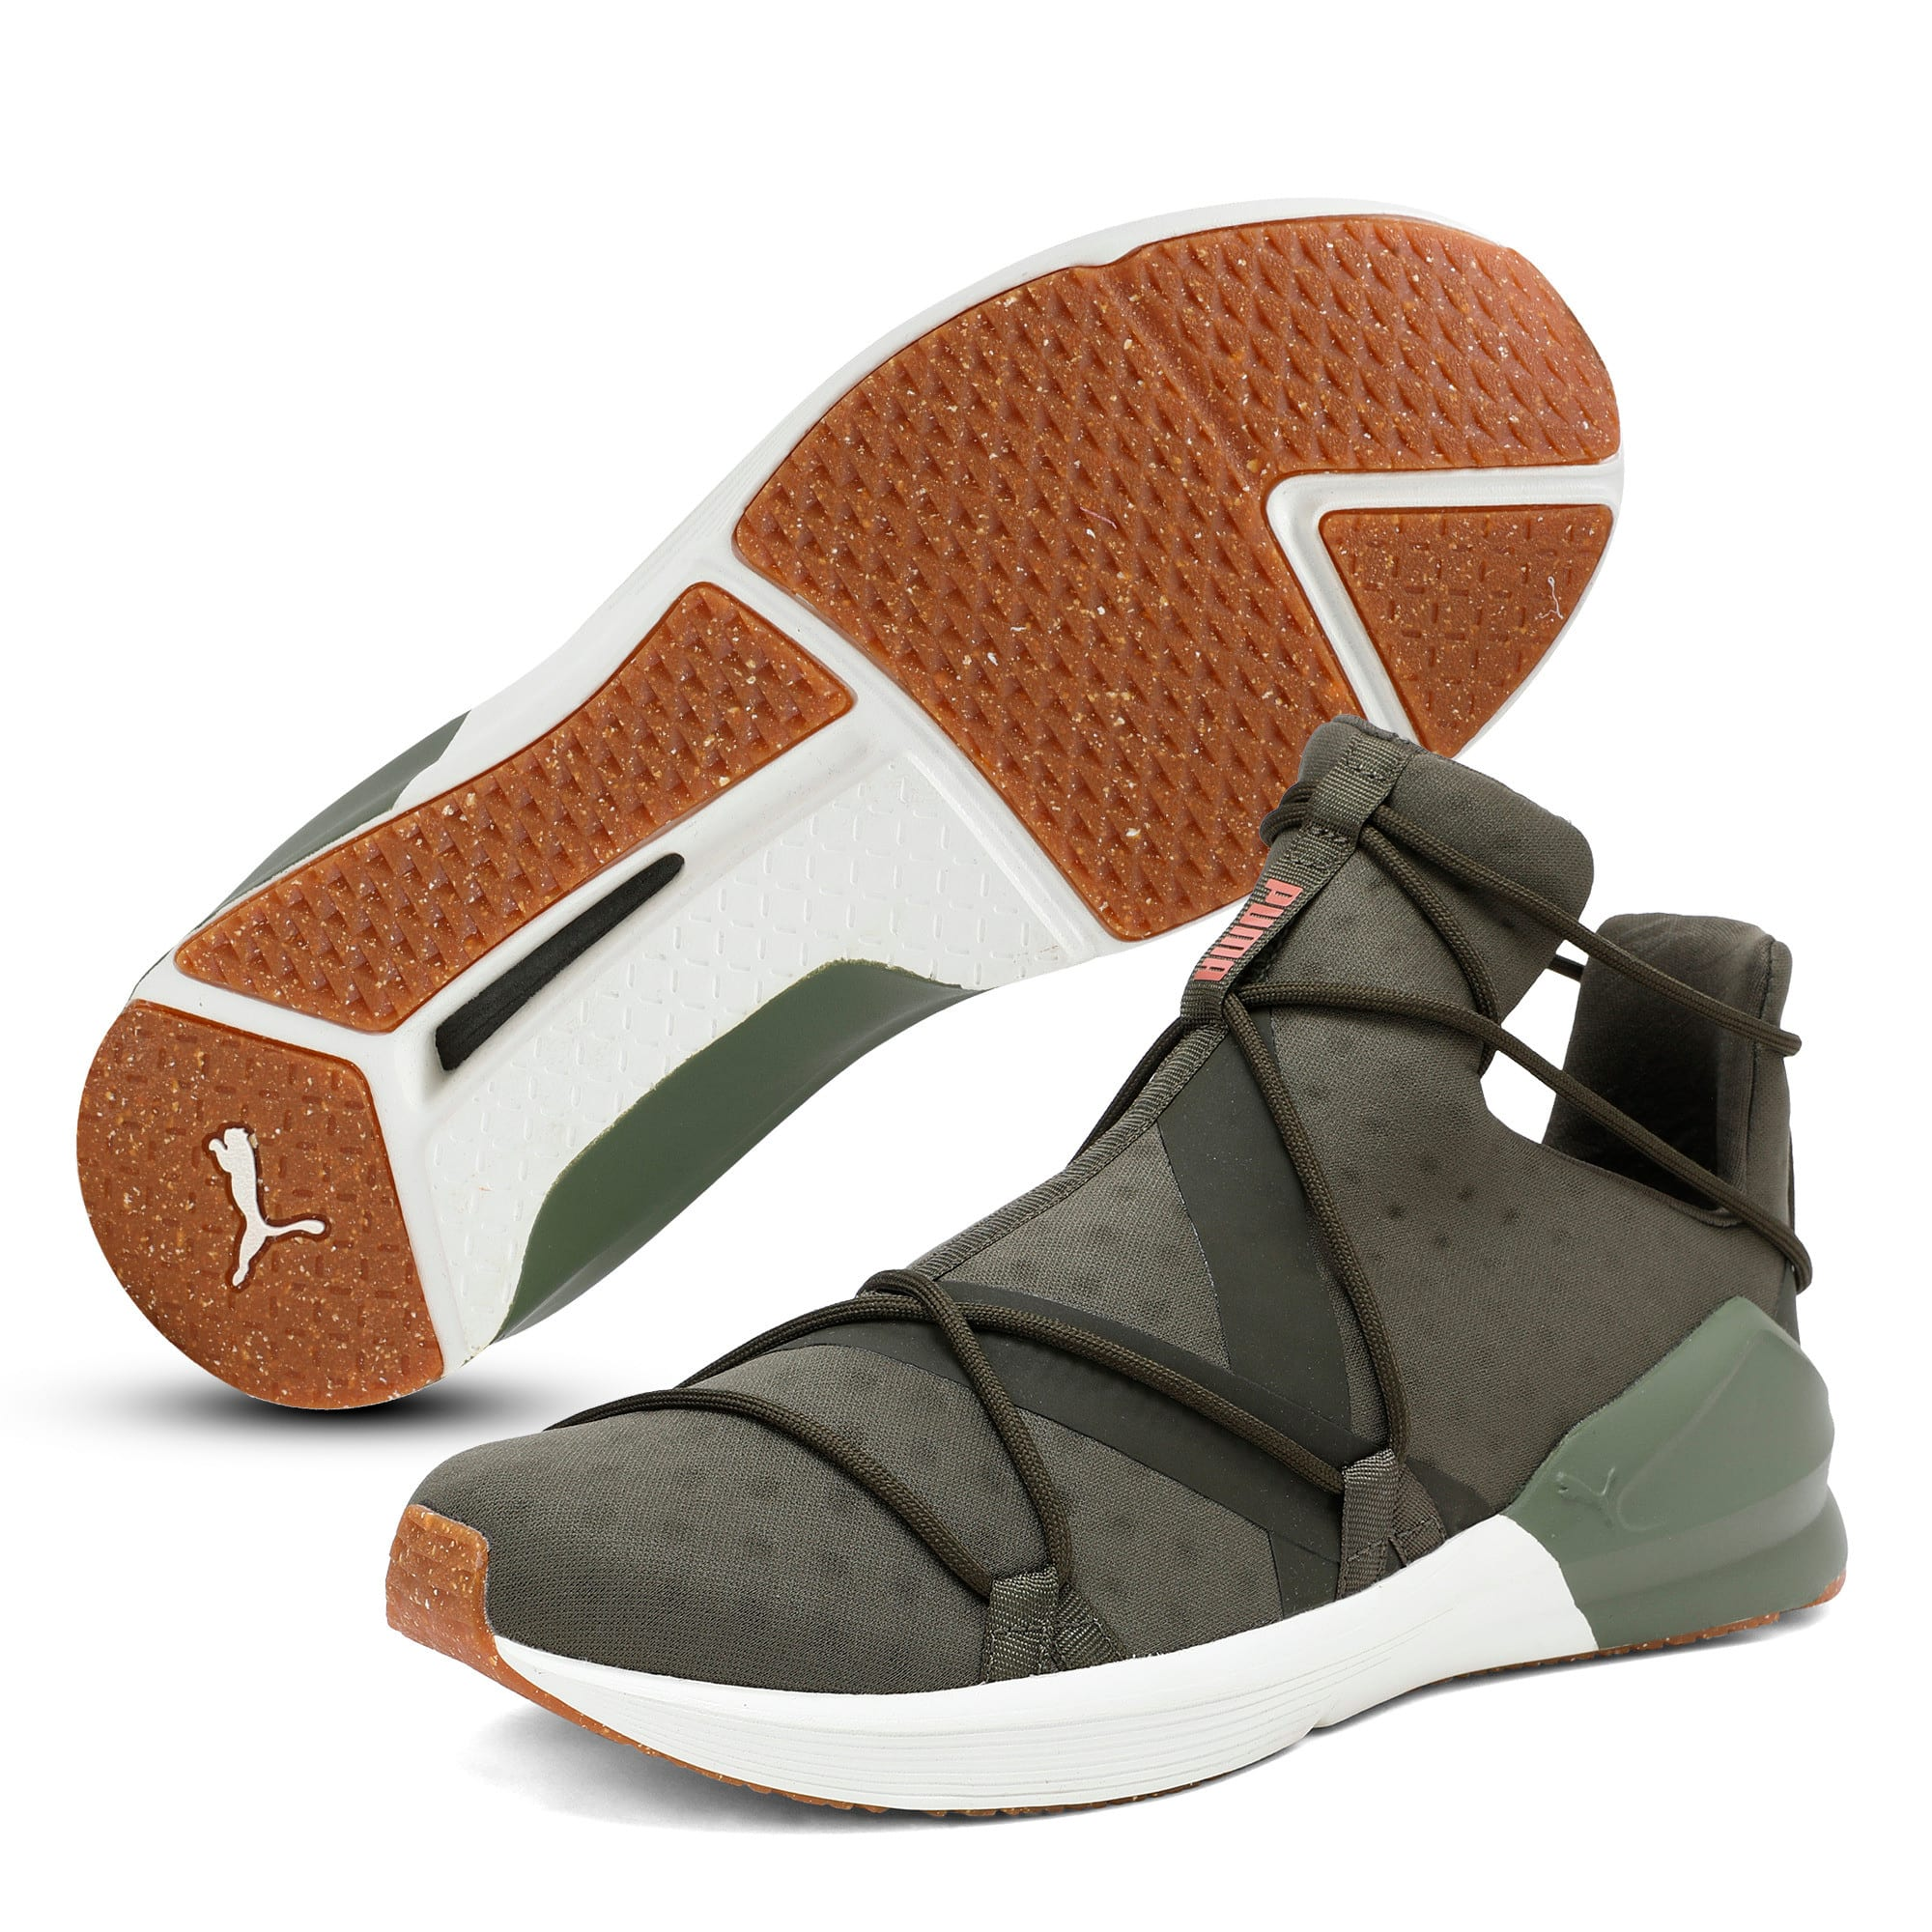 Thumbnail 2 of Fierce Rope VR Women's Training Shoes, Olive Night-Whisper White, medium-IND